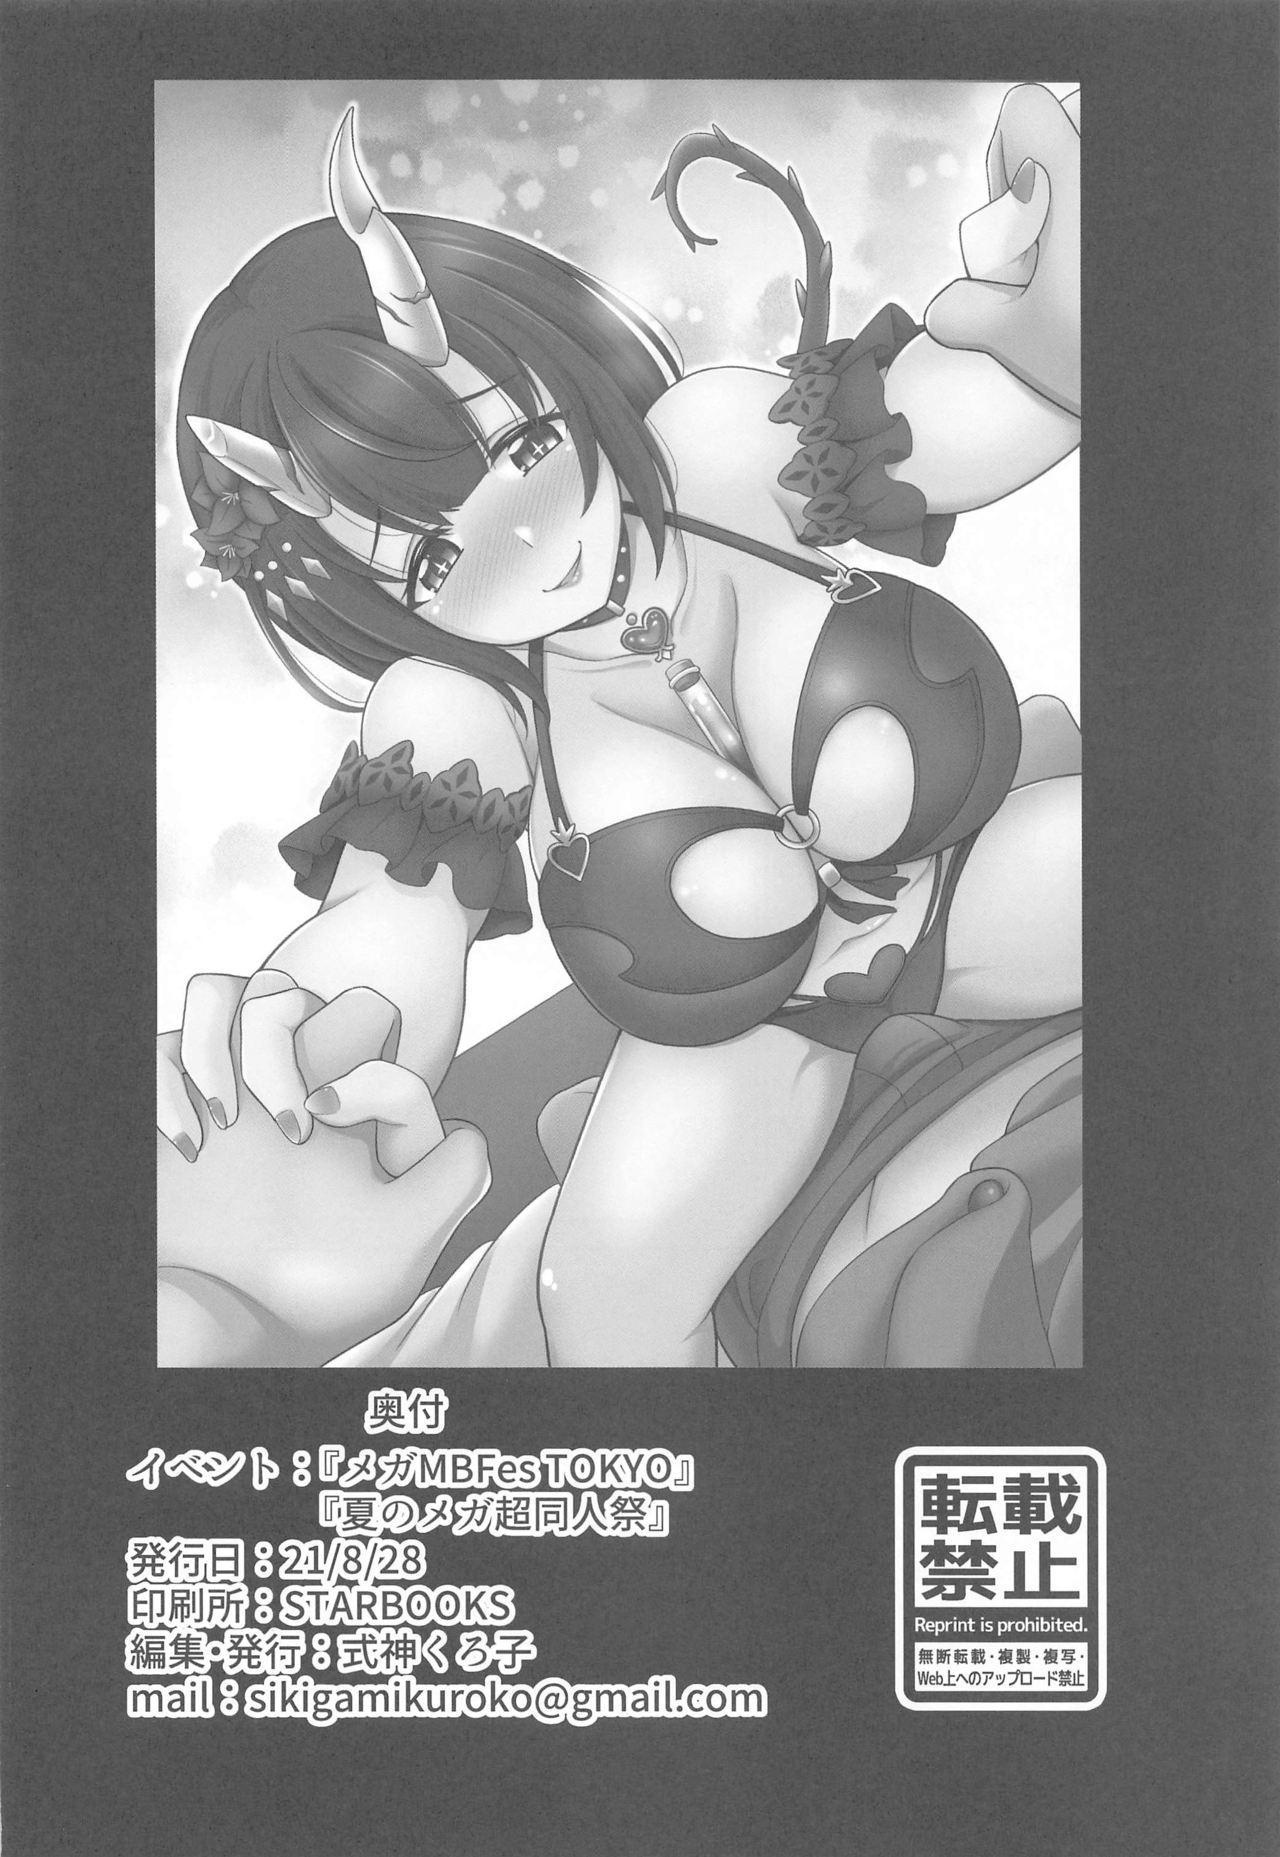 (Mega MBFes TOKYO in Tokyo Ryuutsuu Center) [Kurokoya (Shikigami Kuroko)] Anata-sama Senyou Soap-jou Eriko (Princess Connect! Re:Dive) 26